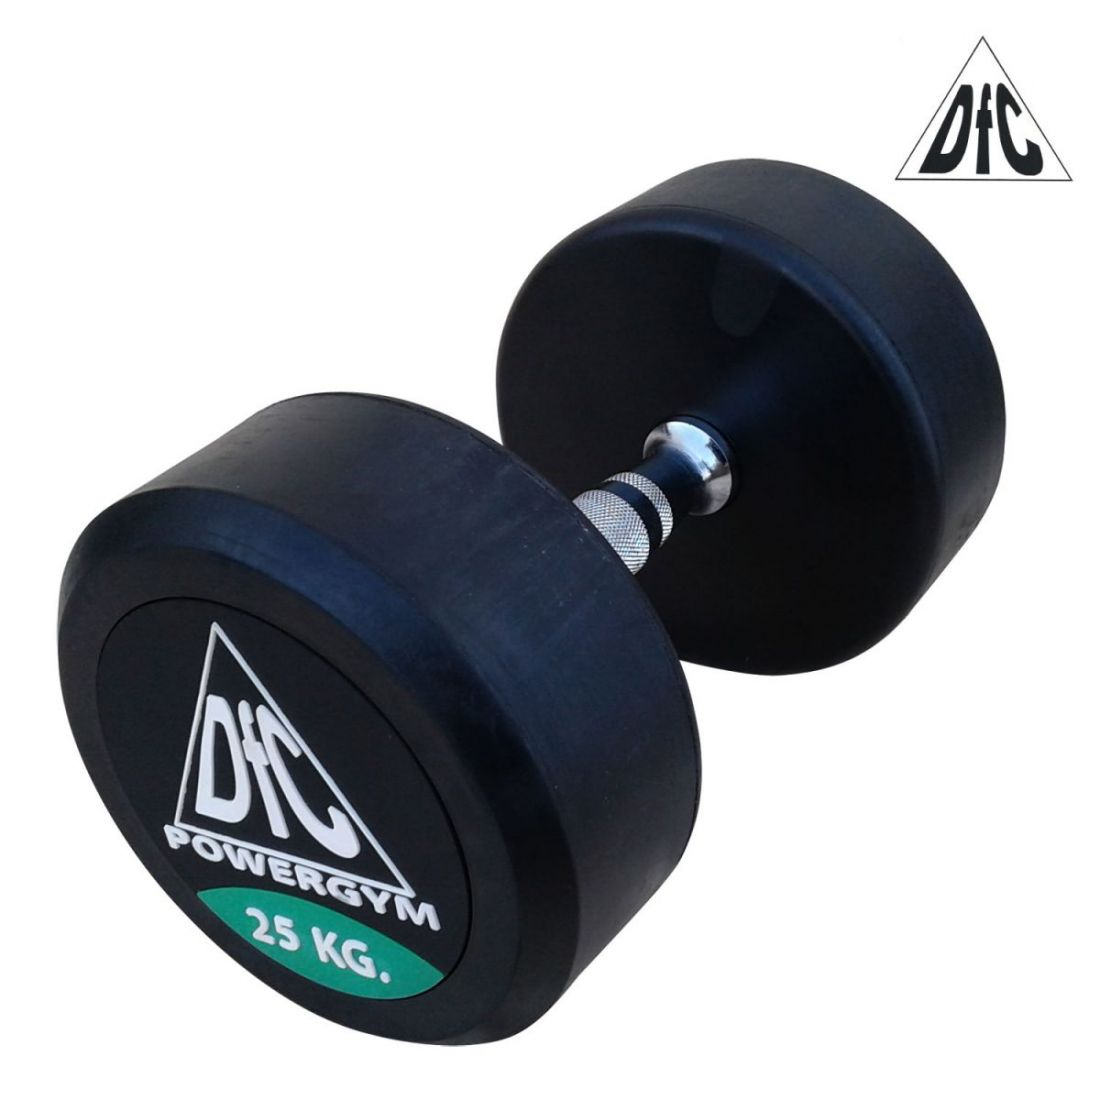 Гантели пара 25 кг DFC POWERGYM DB002-25